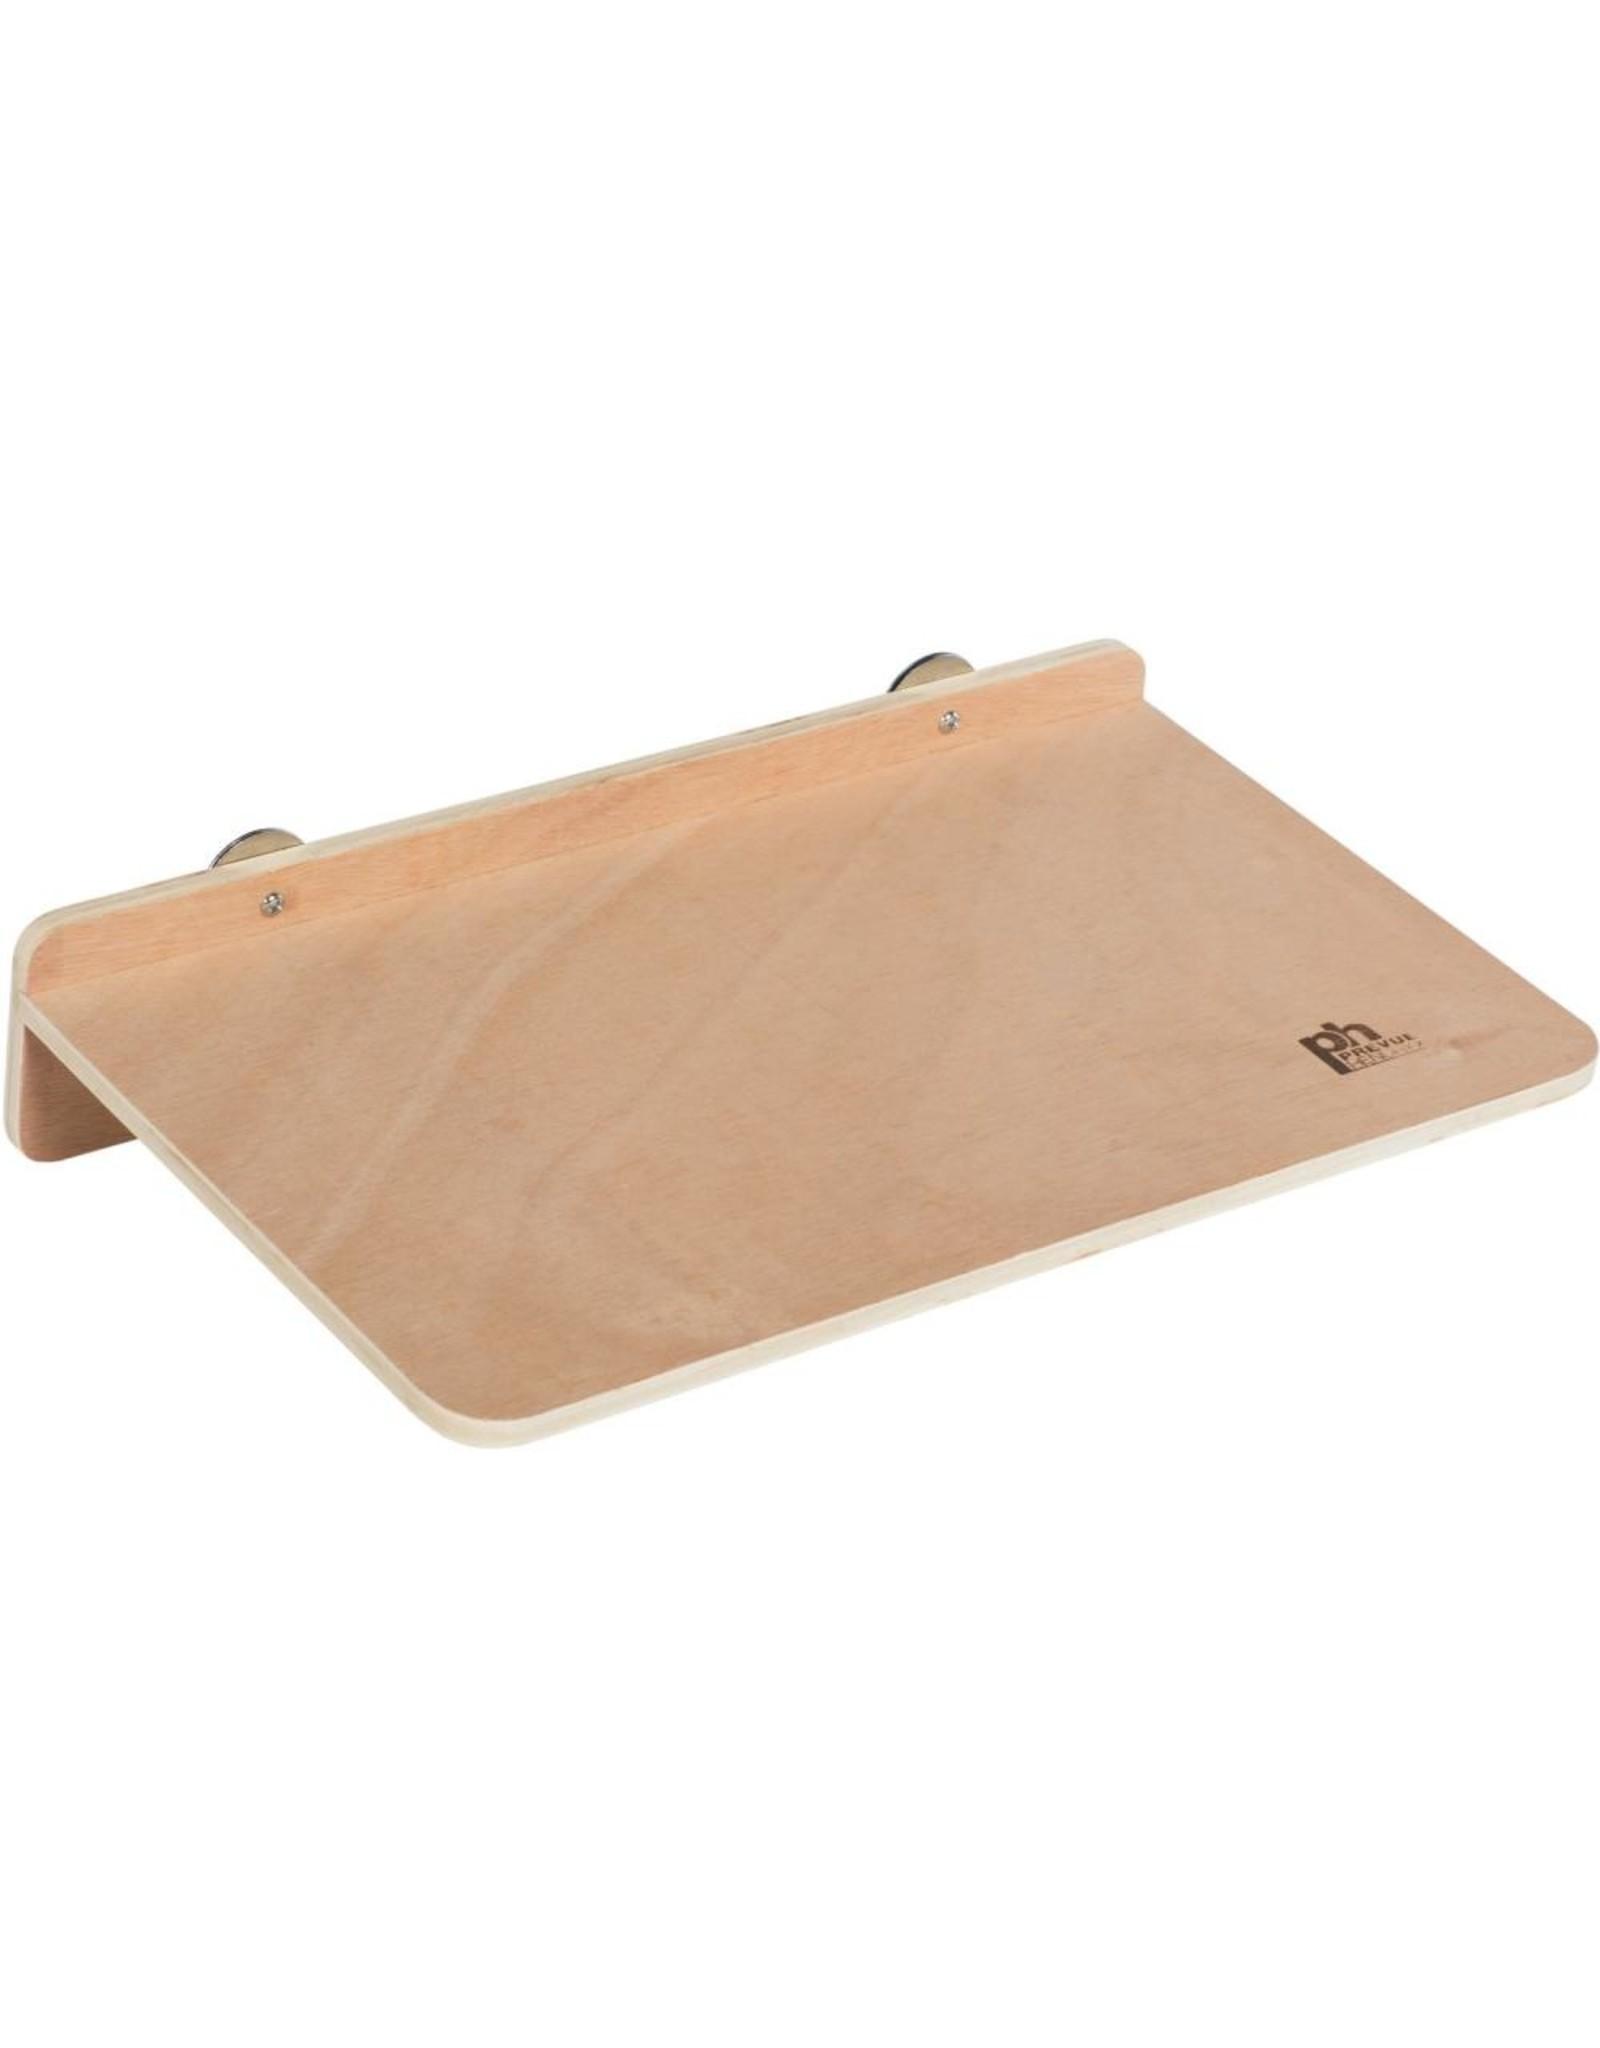 Prevue PREVUE Pet Wooden Platform Shelf XL